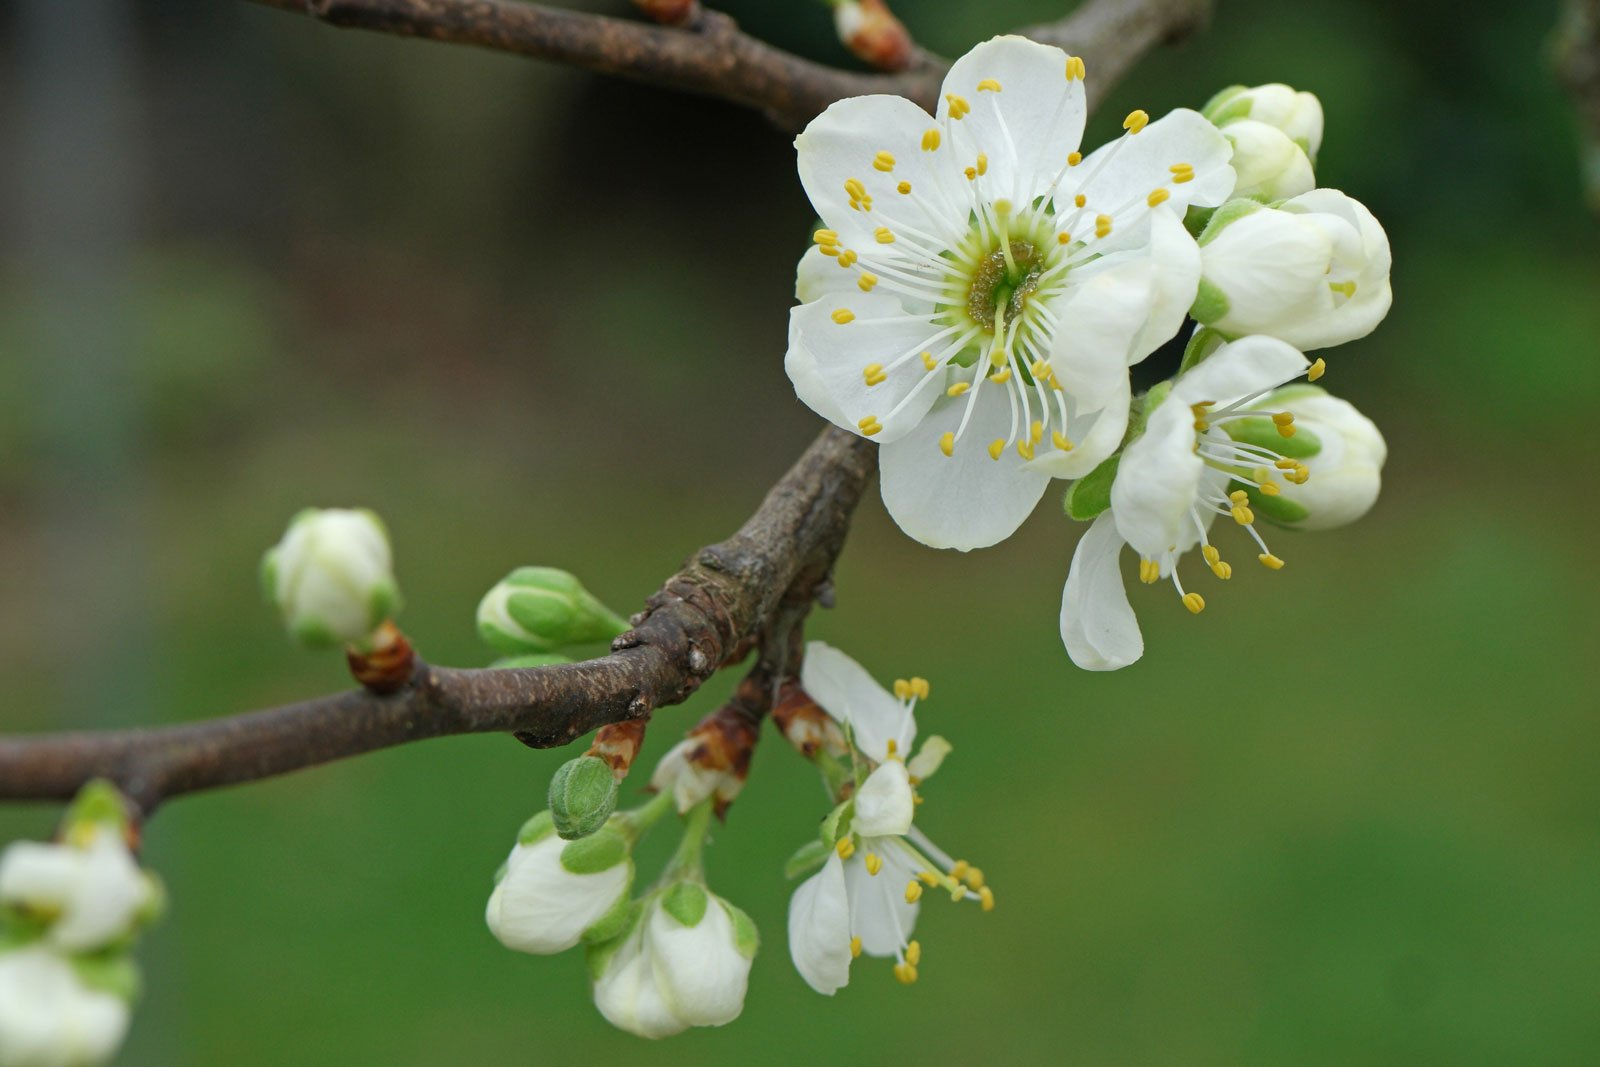 Prunus domestica syriaca